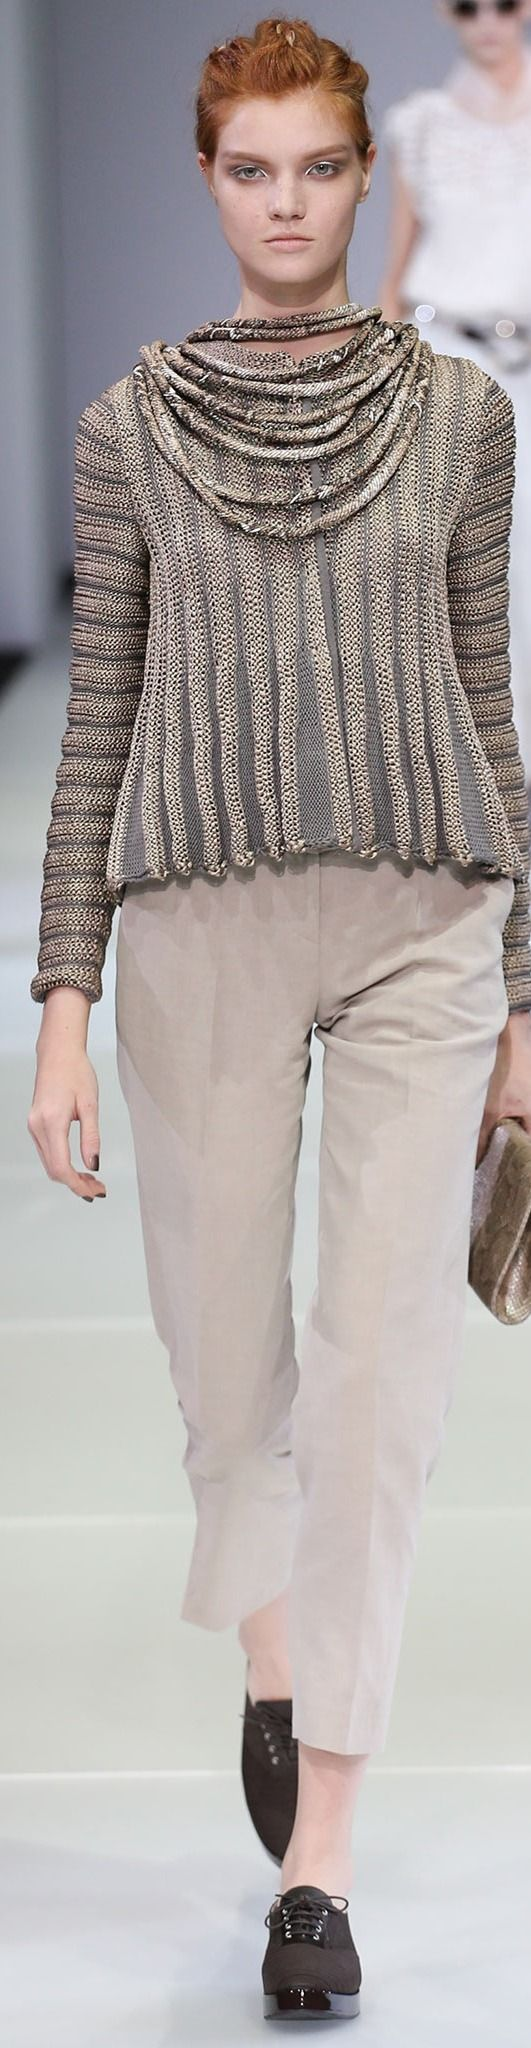 Giorgio Armani Collection Spring 2015 Love the top